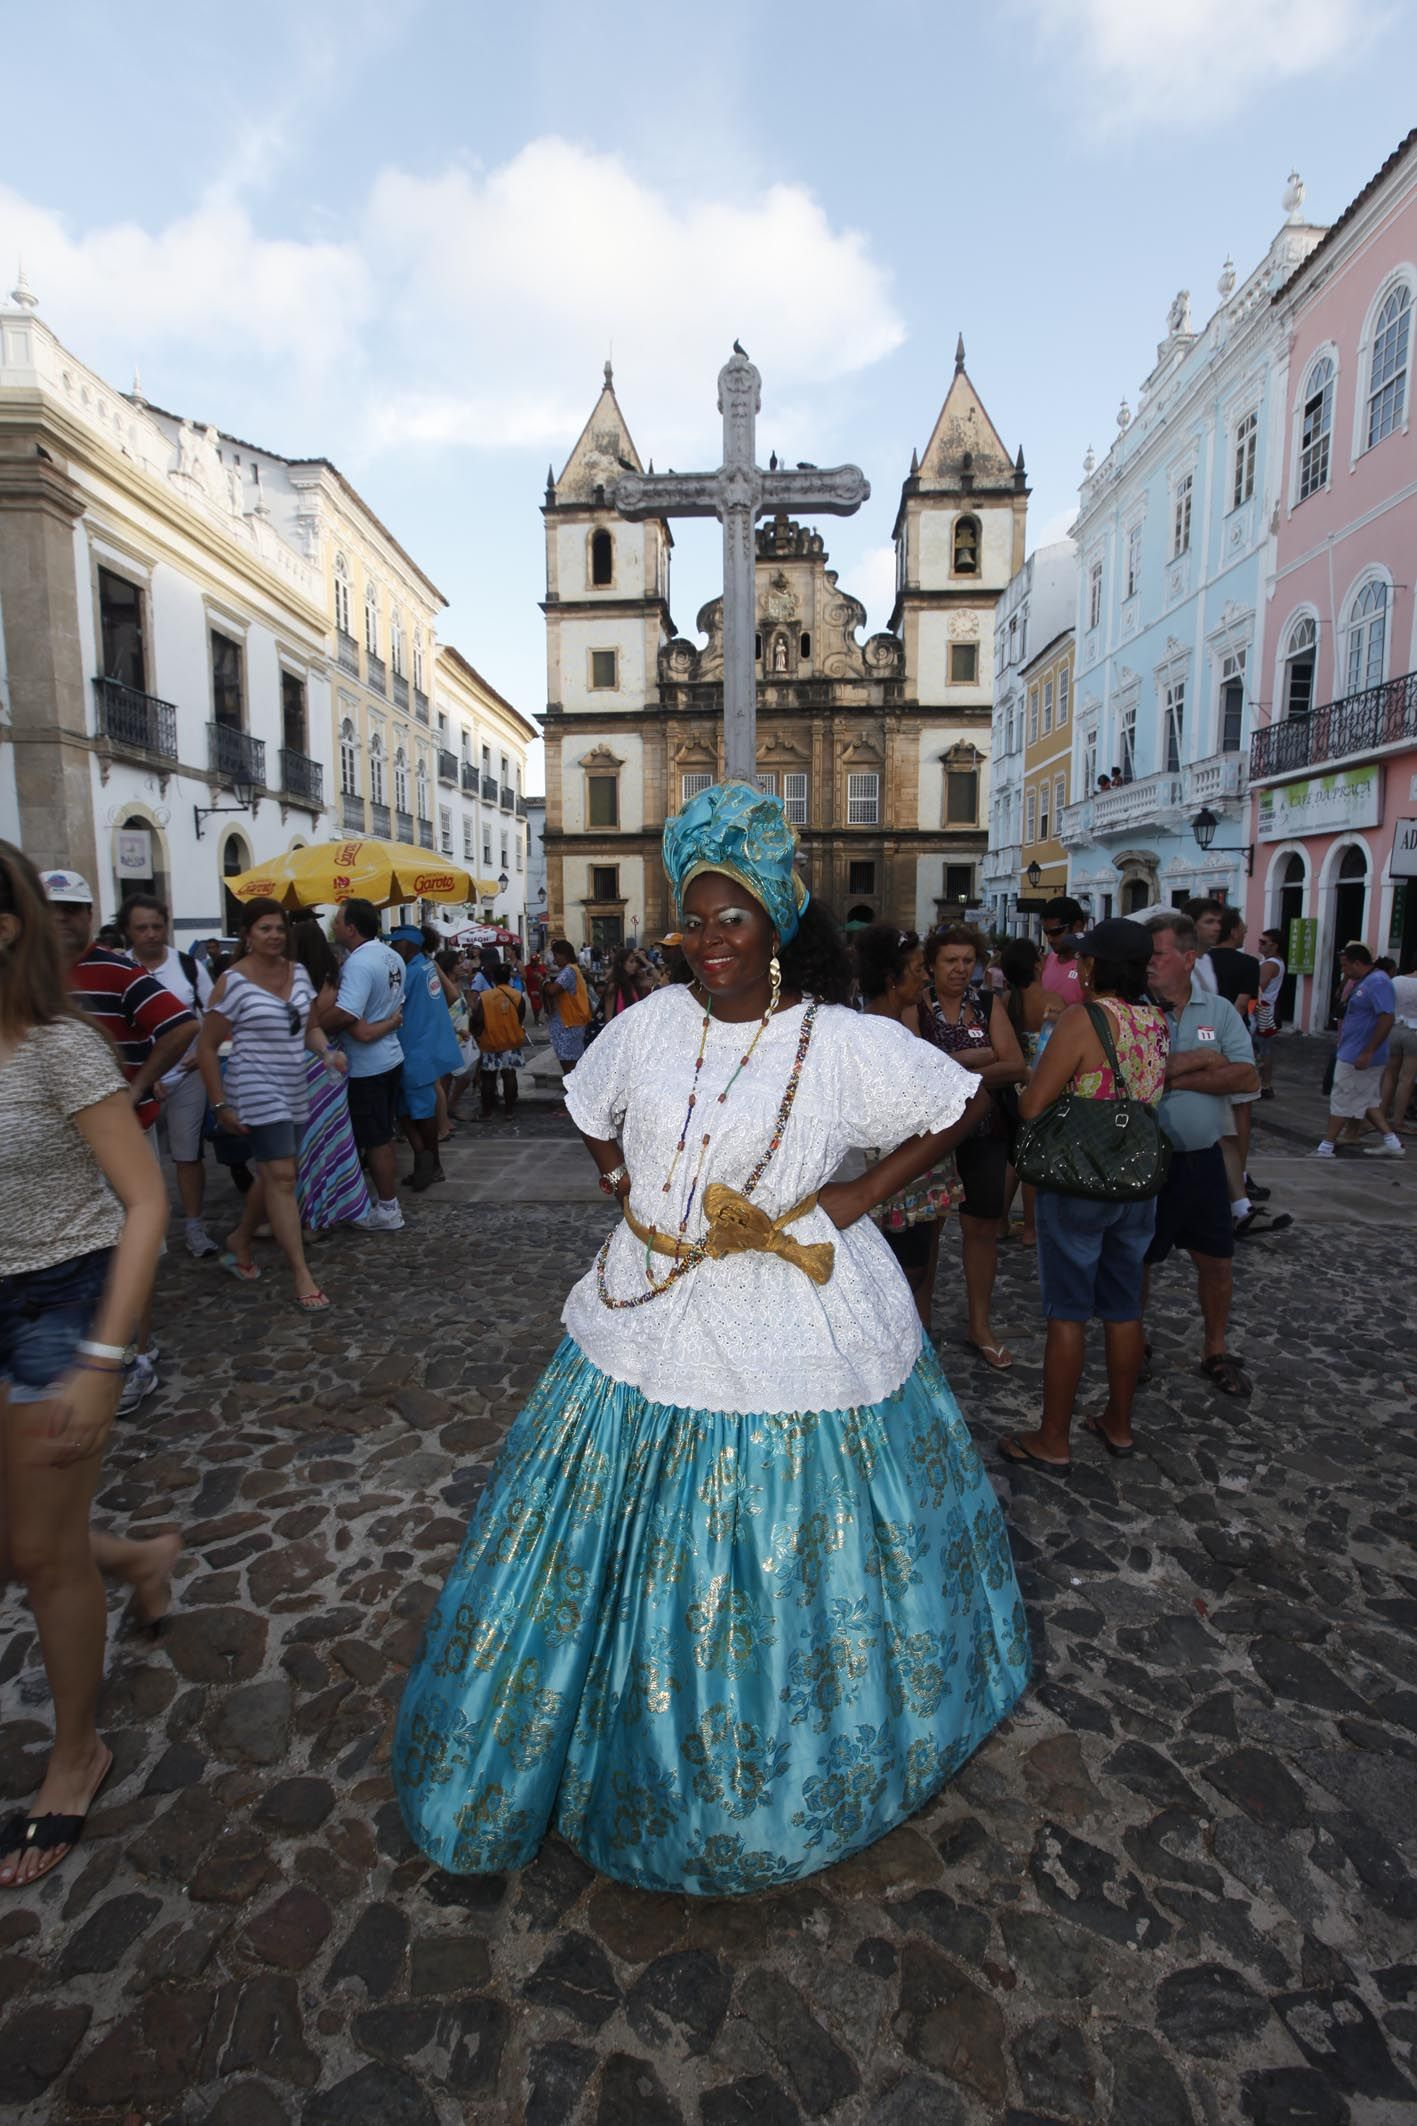 Verão lembra carnaval... Carnaval lembra Bahia.. Bahia lembra baianas :)